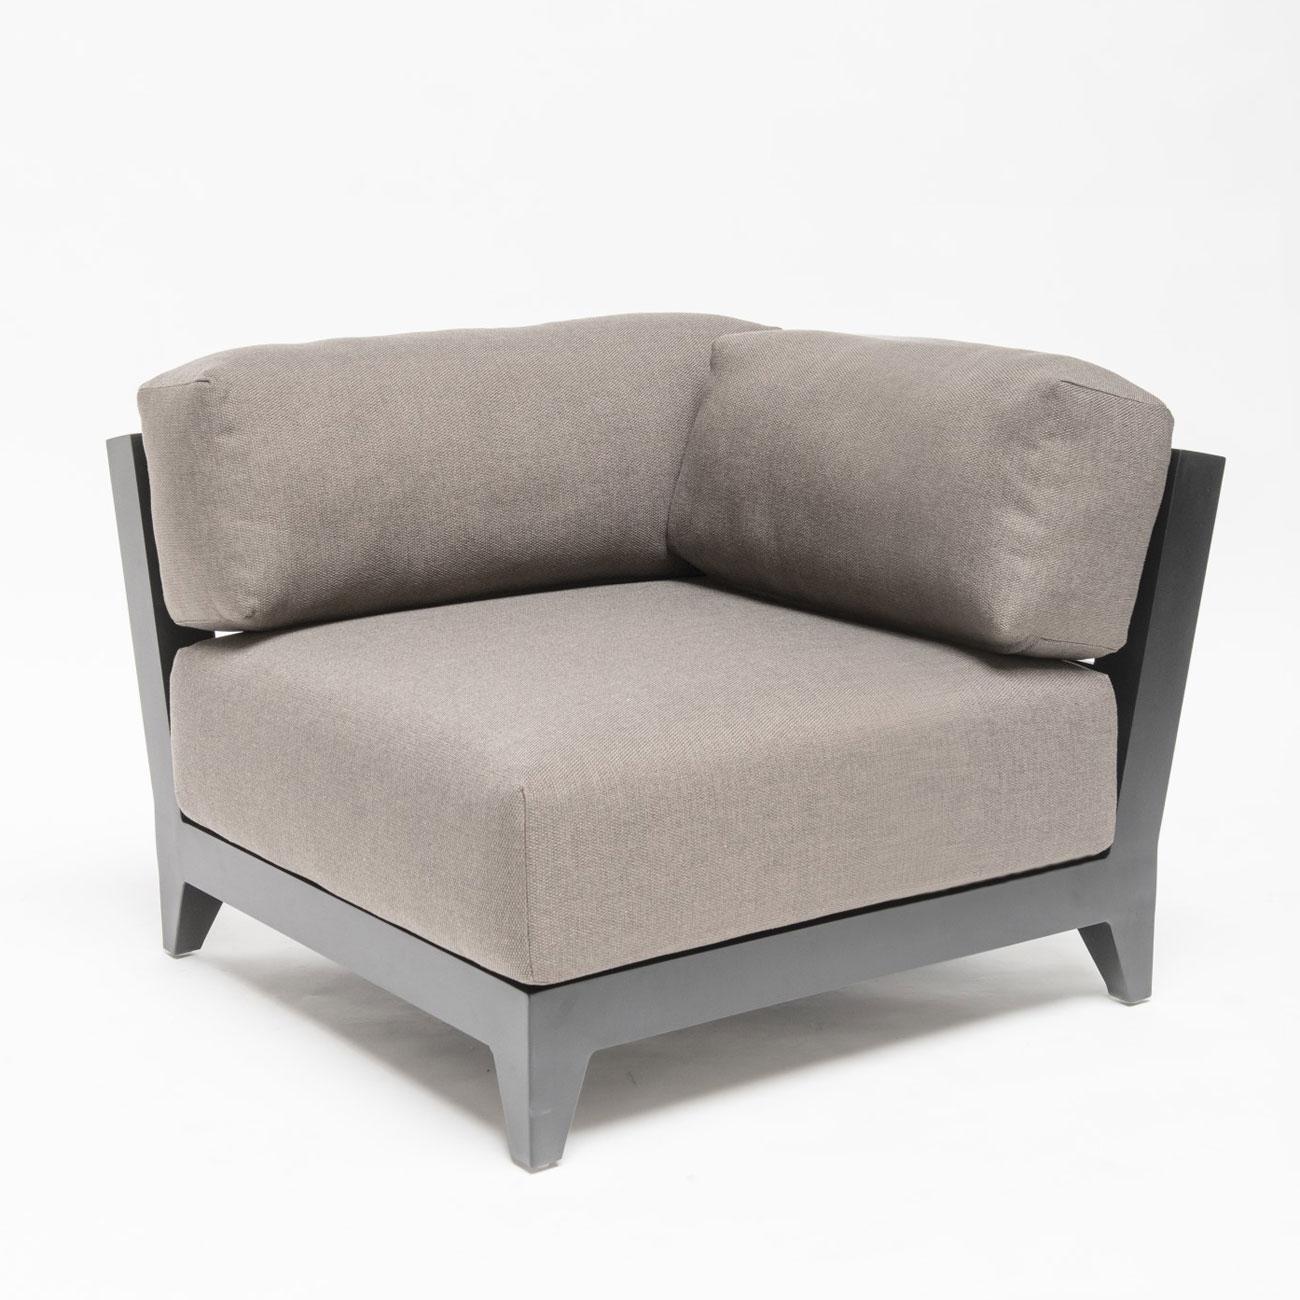 Garden Sofa Corner Unit: Gommaire Mia Aluminium Modular Sofa